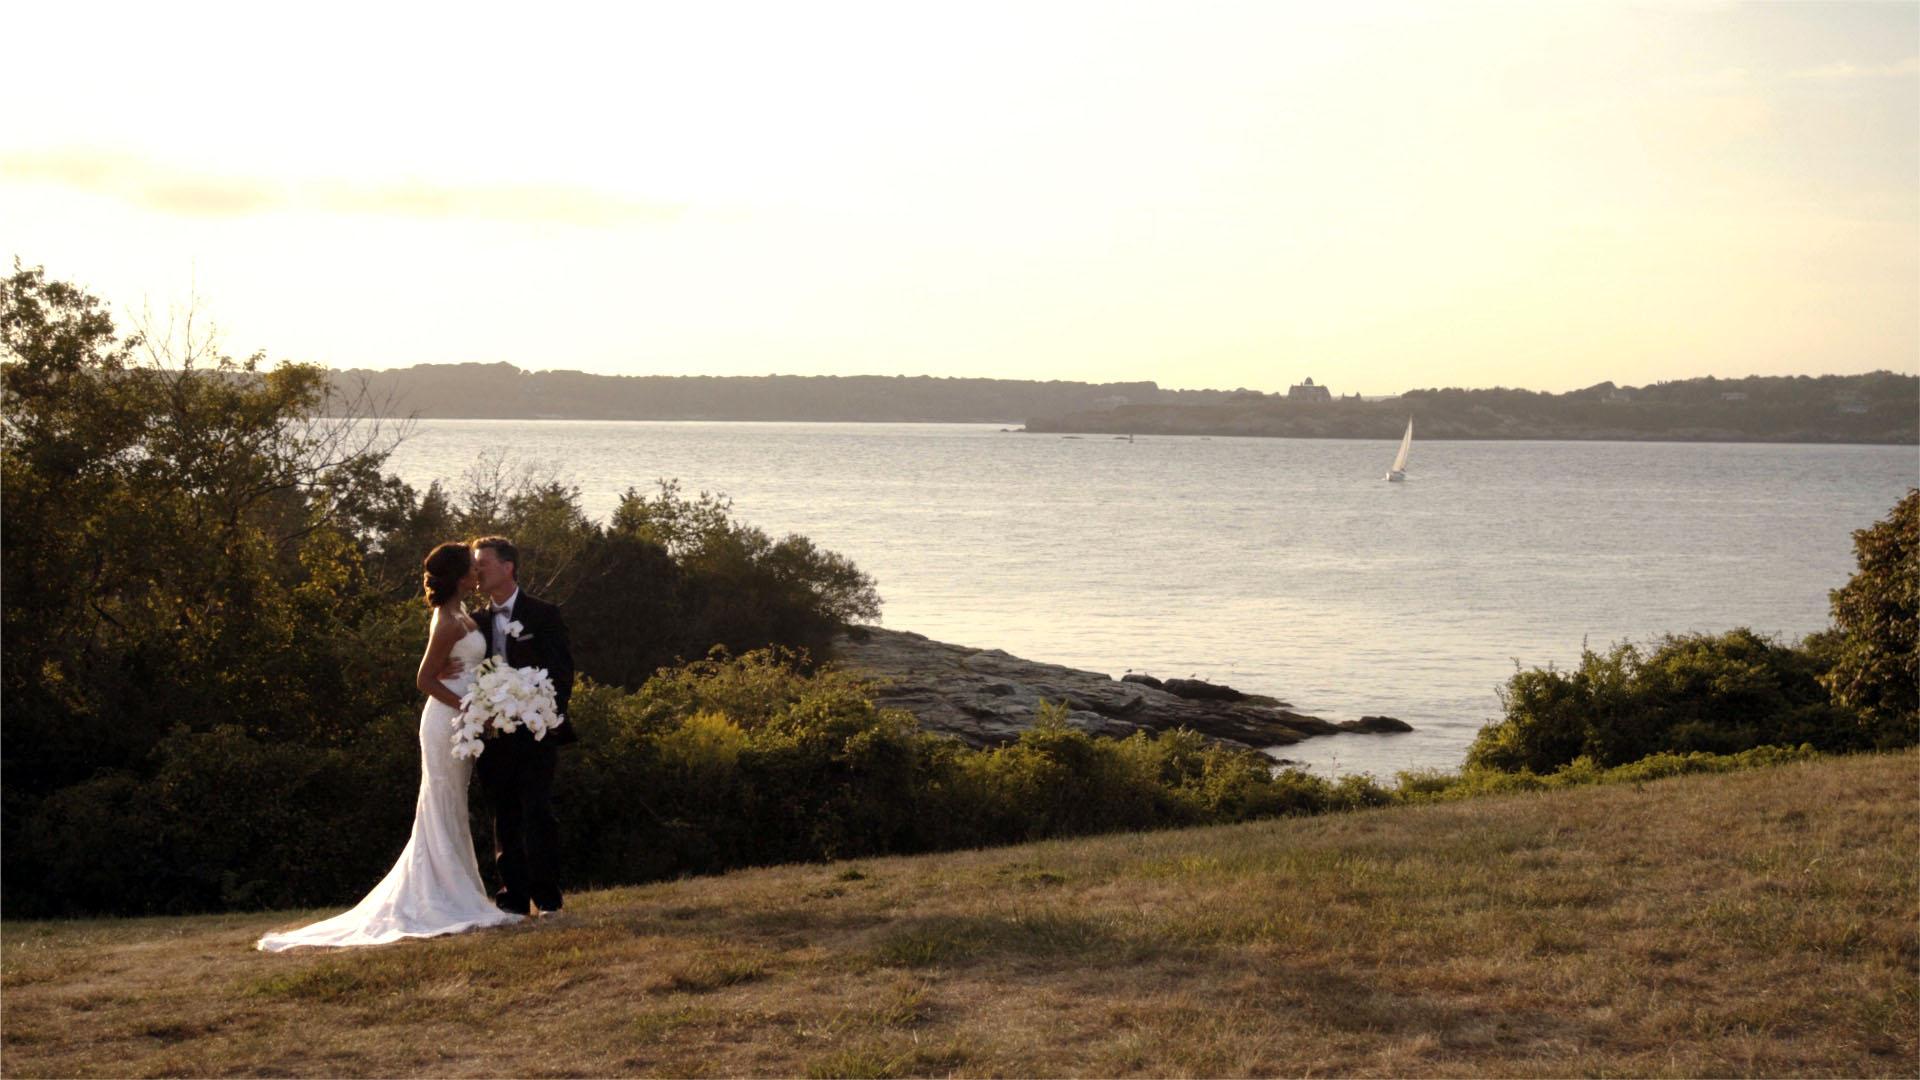 Natalie + John | Newport, Rhode Island | Oceancliff